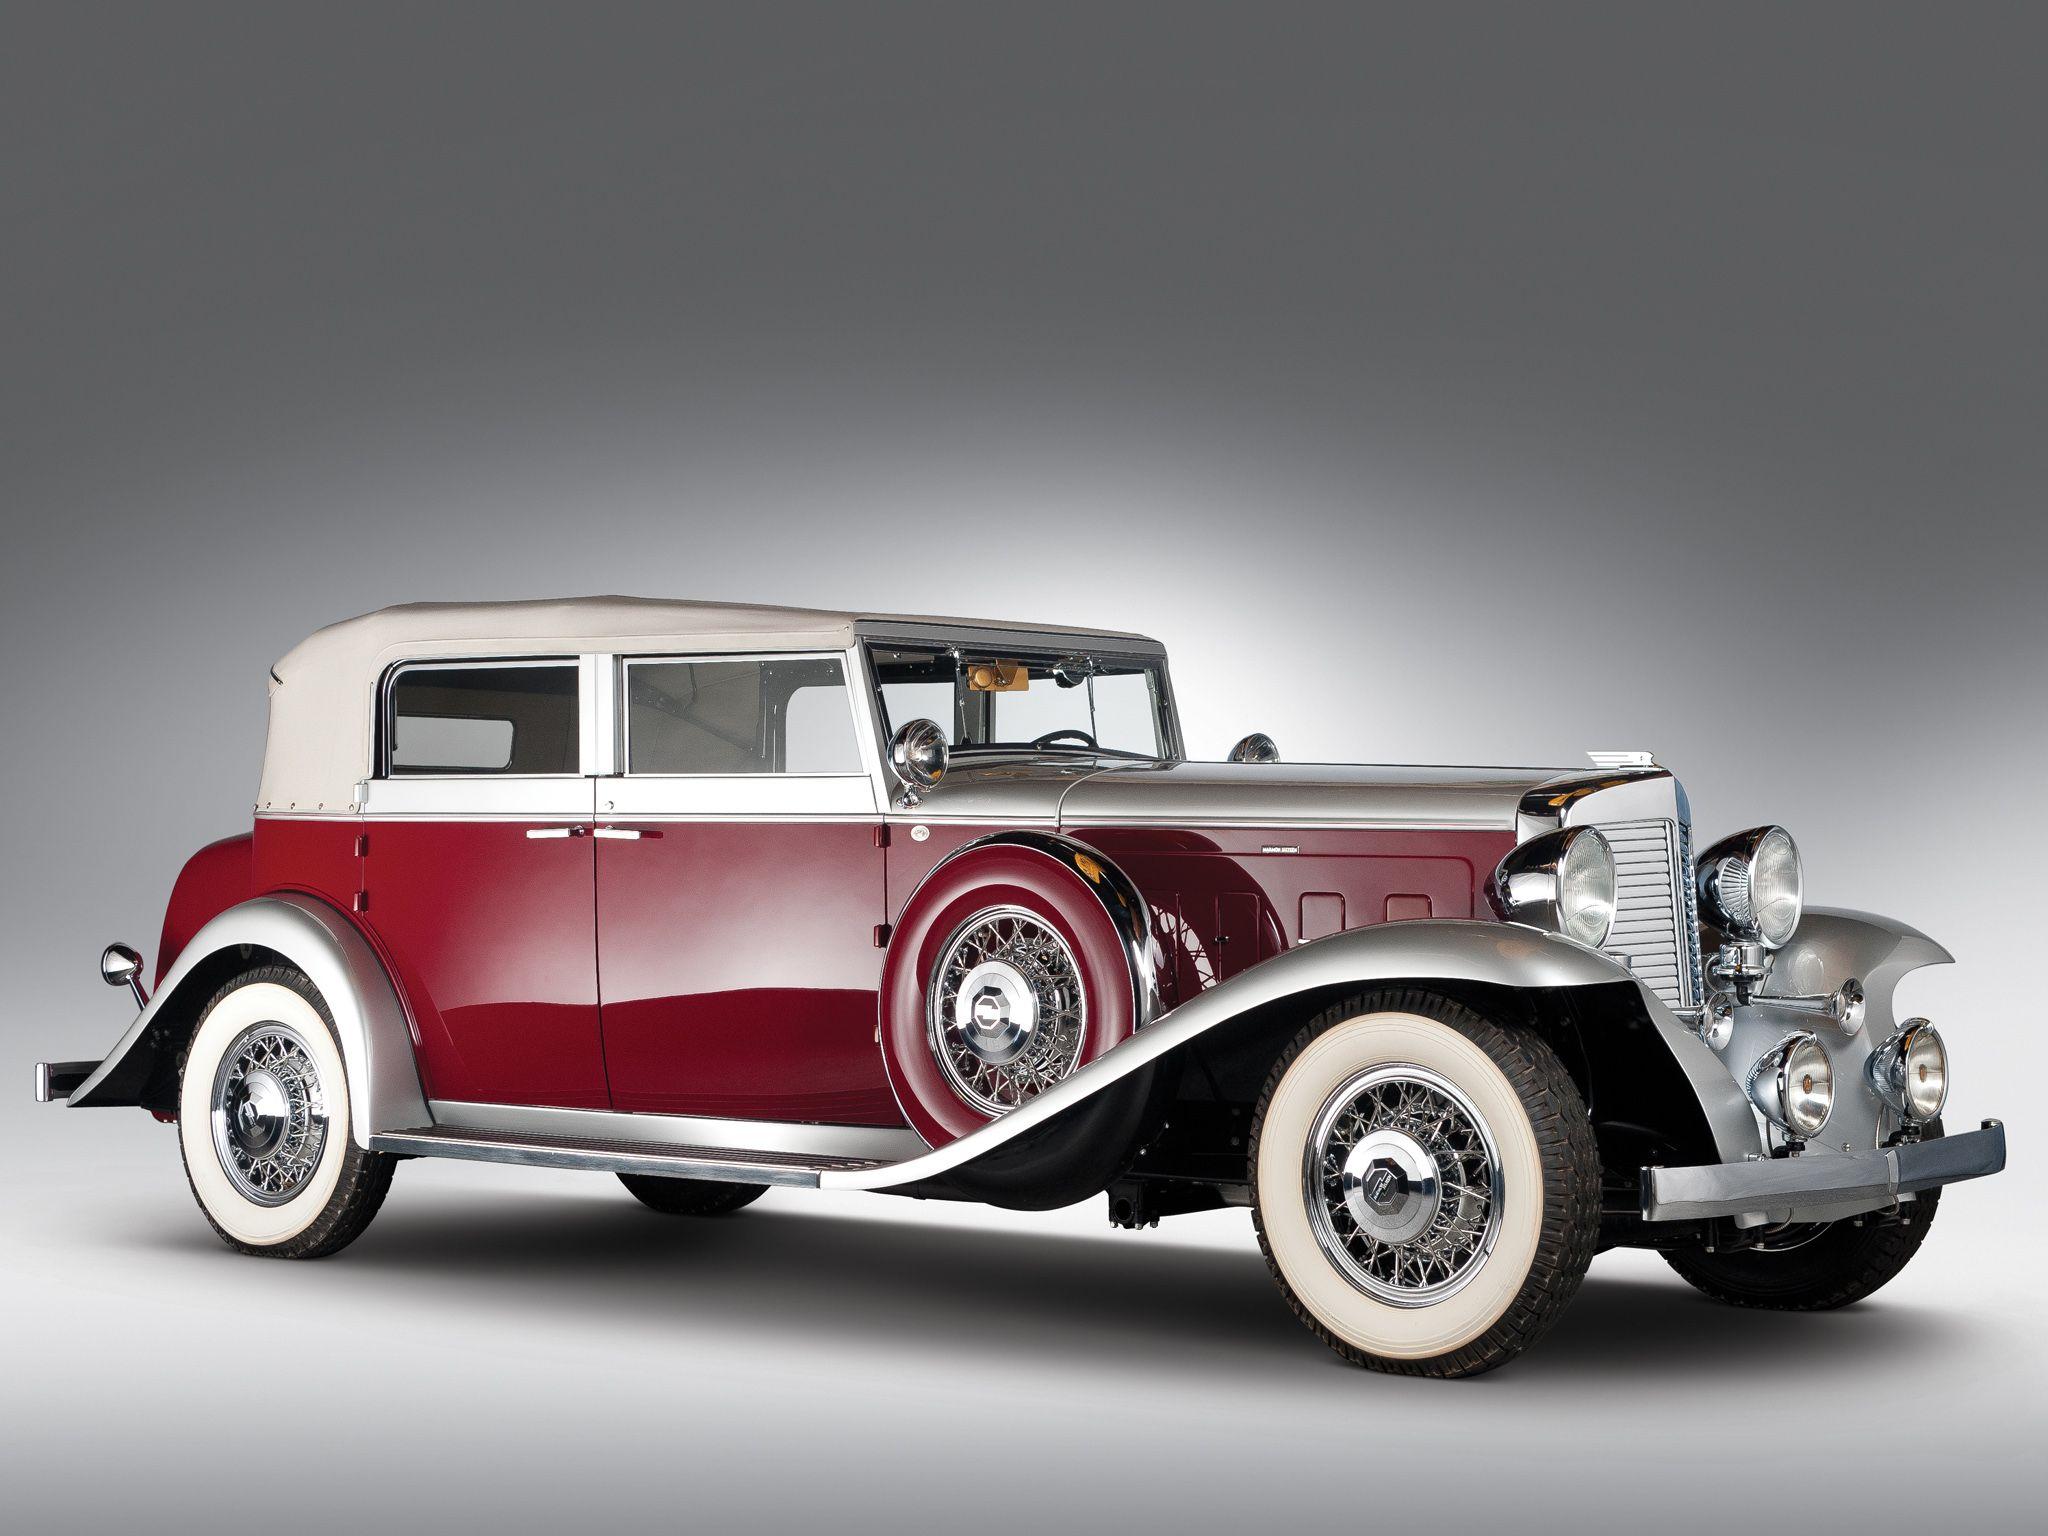 1933 Marmon Sixteen Convertible Sedan, Produce by Marmon Motor Car ...